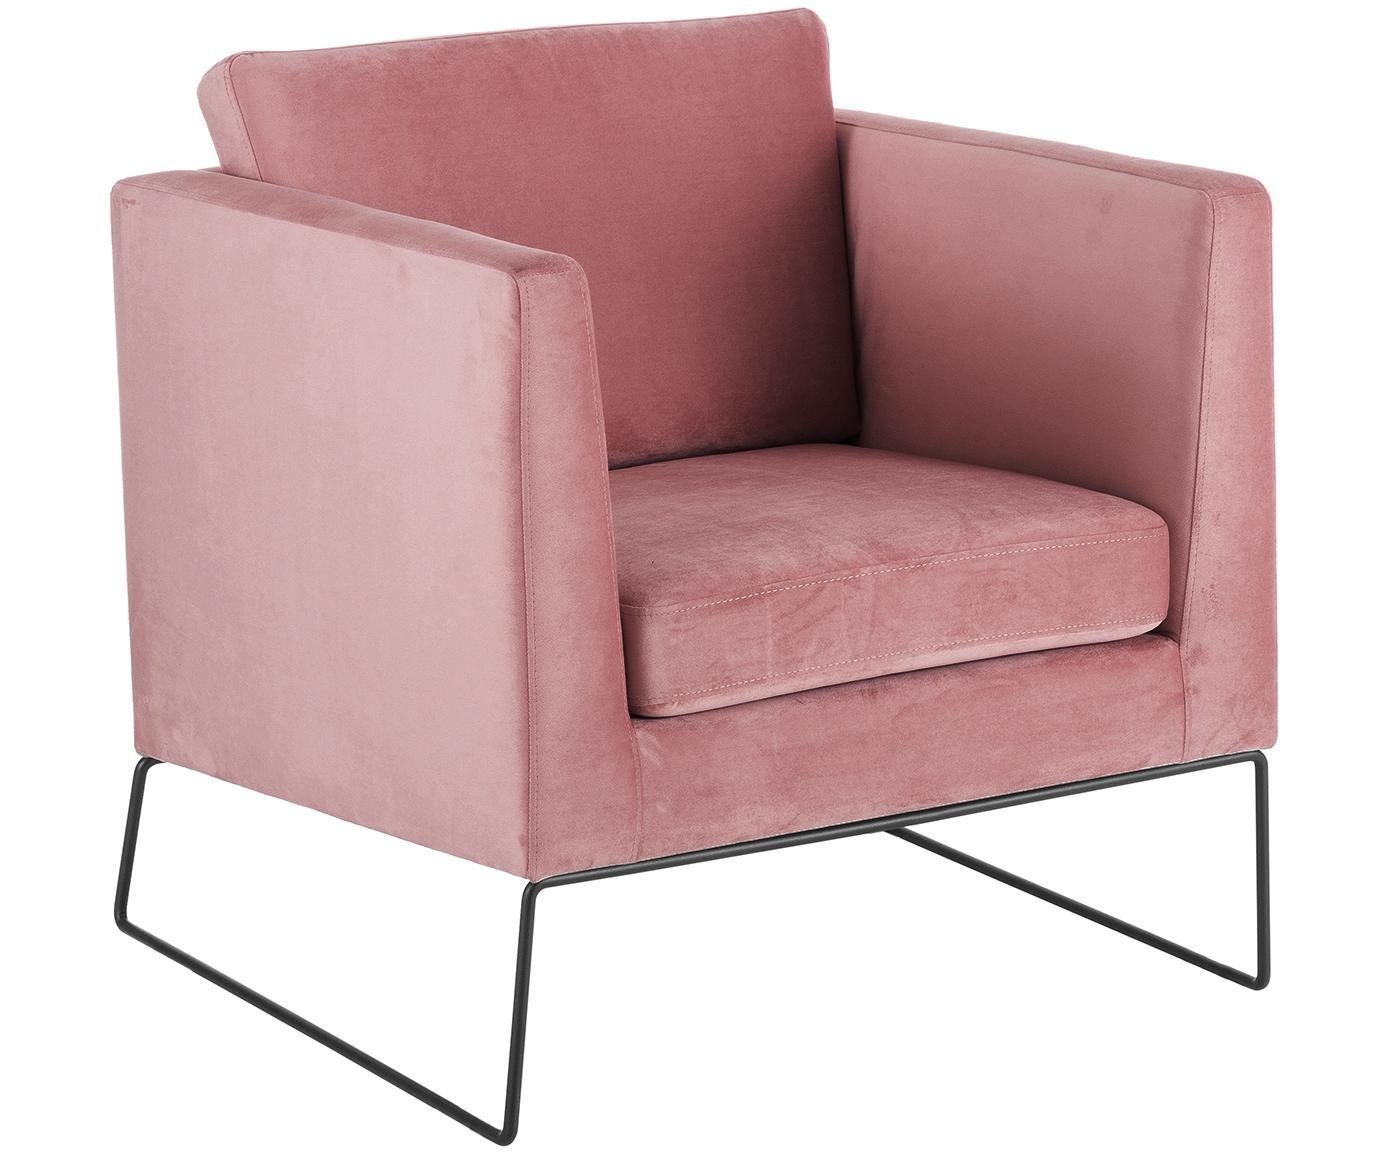 Klassischer Samt-Sessel Milo in Rosa, Bezug: Samt (hochwertiger Polyes, Gestell: Kiefernholz, Beine: Metall, lackiert, Samt Rosa, 77 x 75 cm